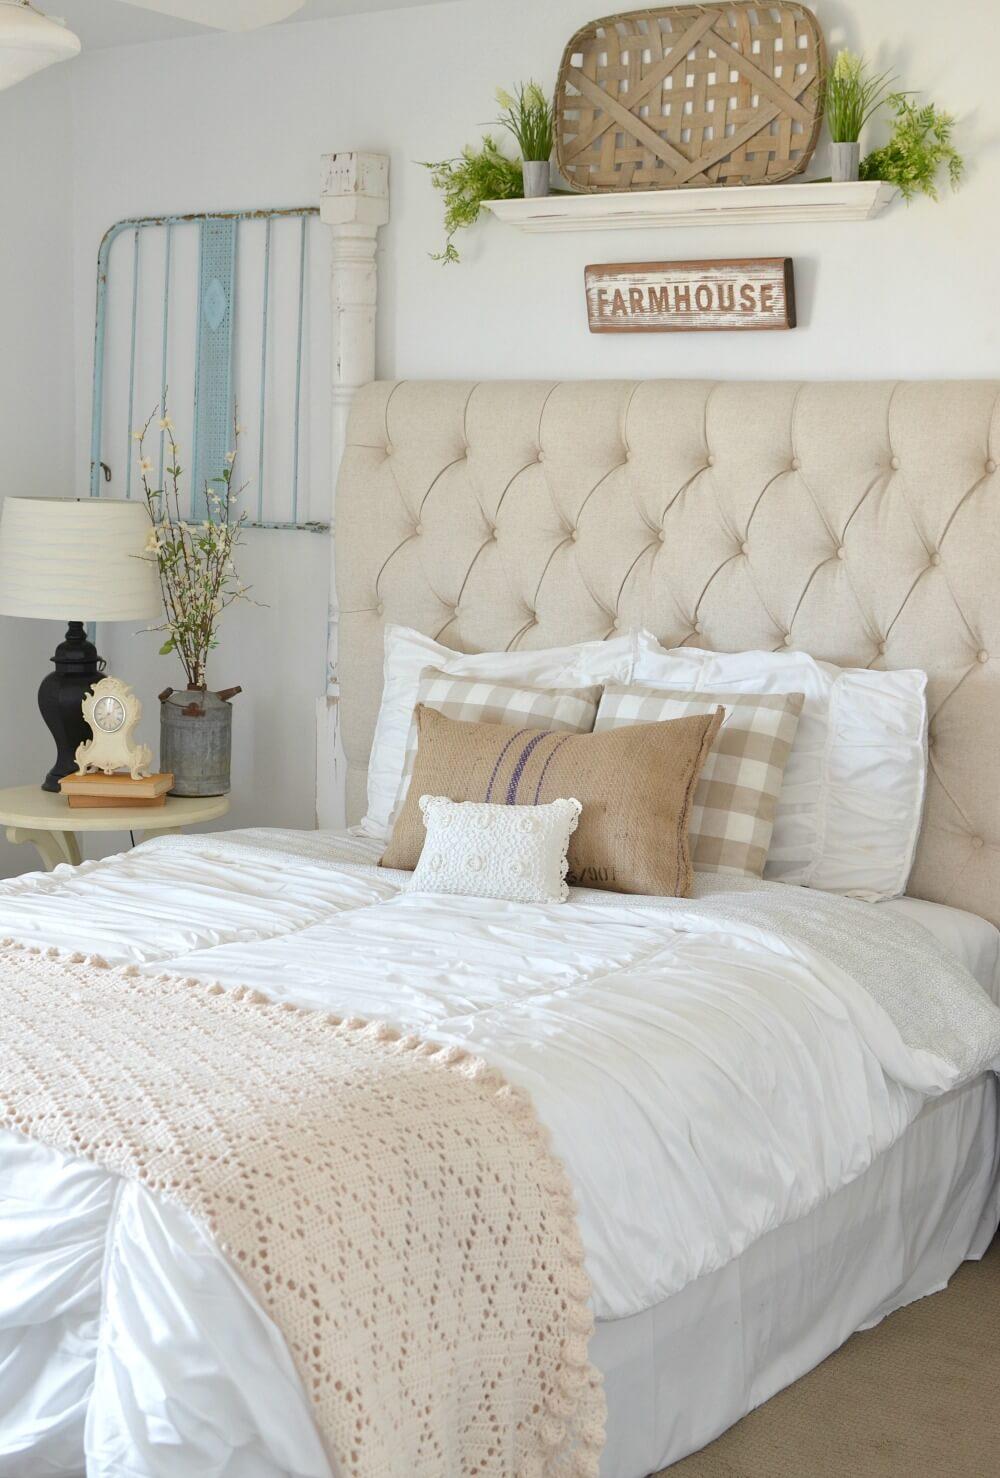 39 Best Farmhouse Bedroom Design and Decor Ideas for 2017 on Bedroom Farmhouse Decor  id=40799